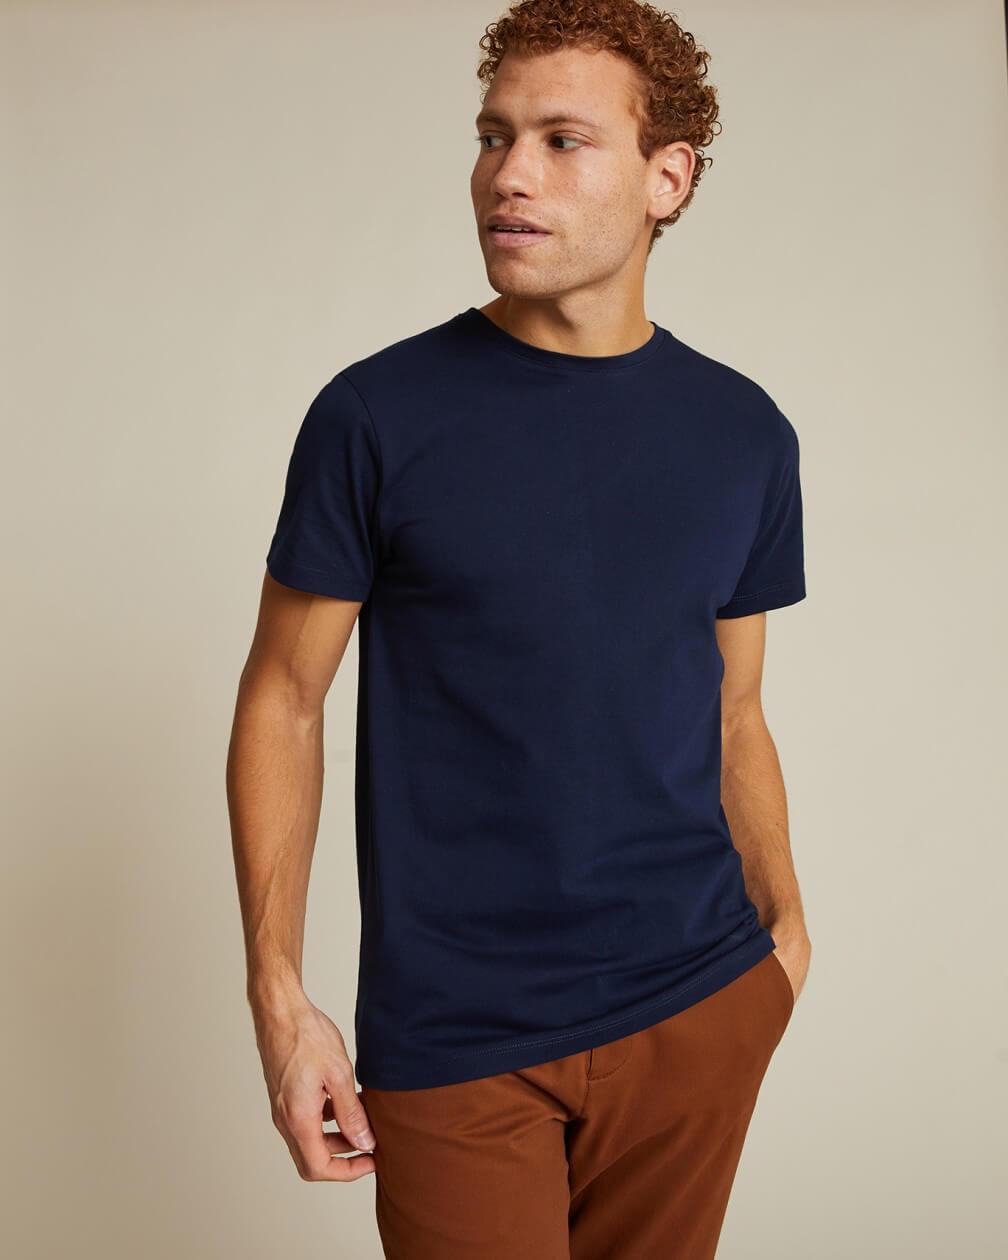 T-shirt Villette marine